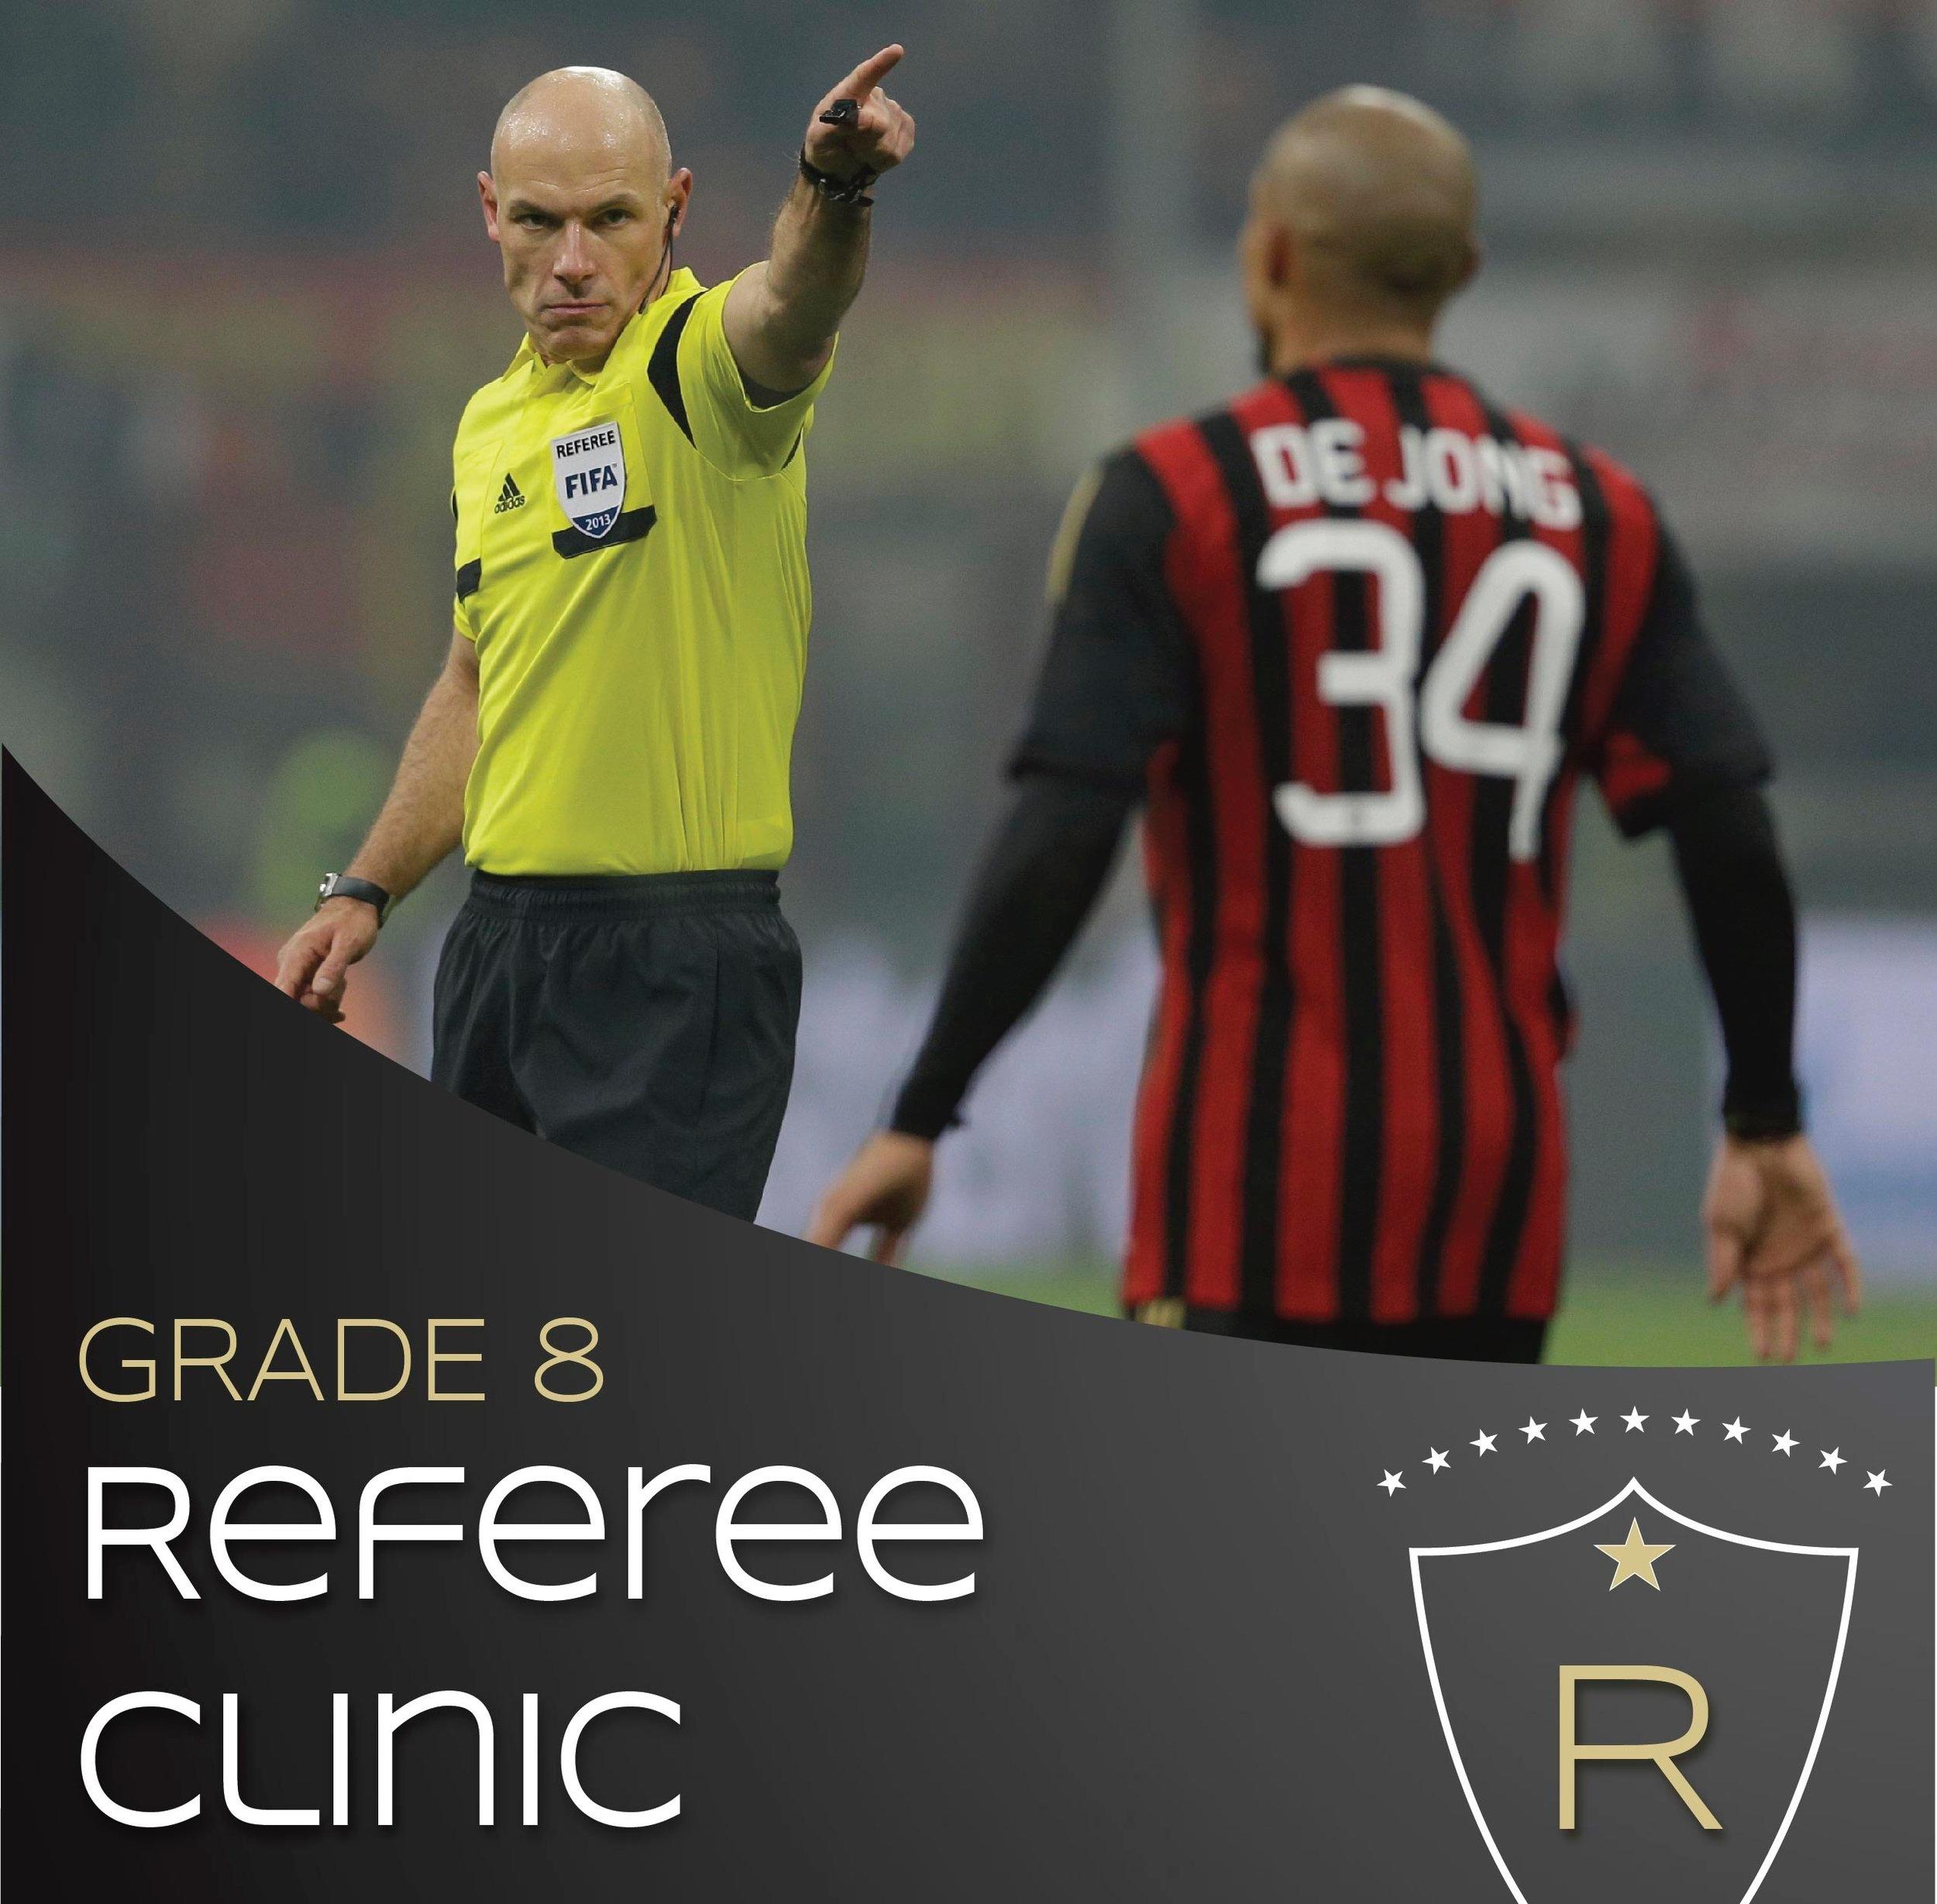 Referee+Clinic+3-01.jpg